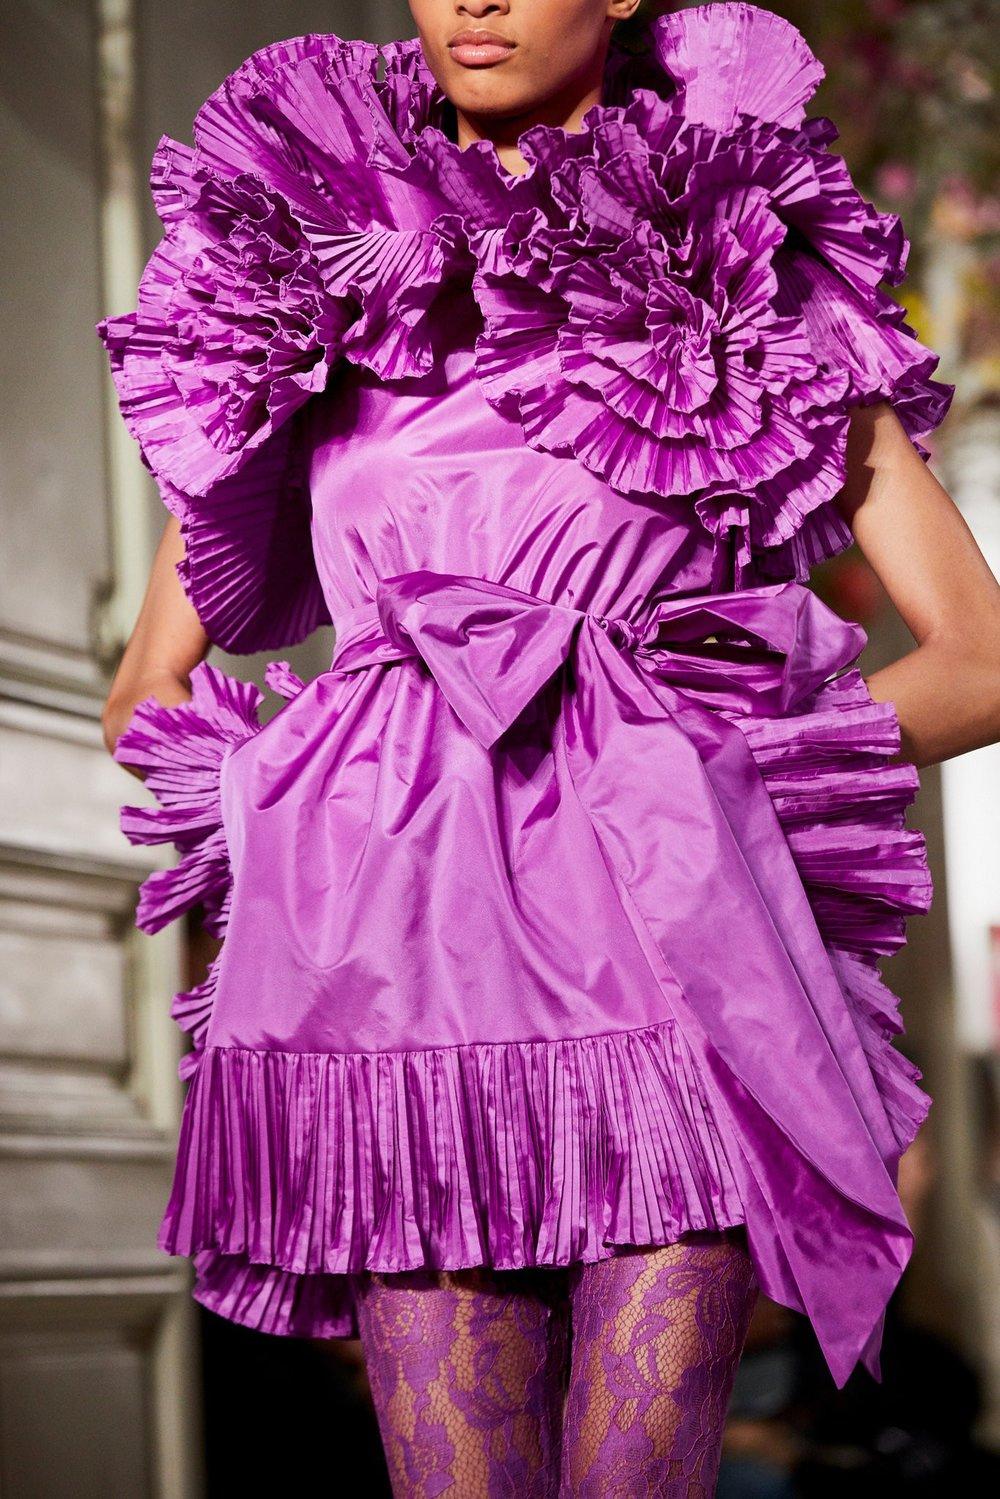 Couture-slide-MJ7N-superJumbo[1].jpg